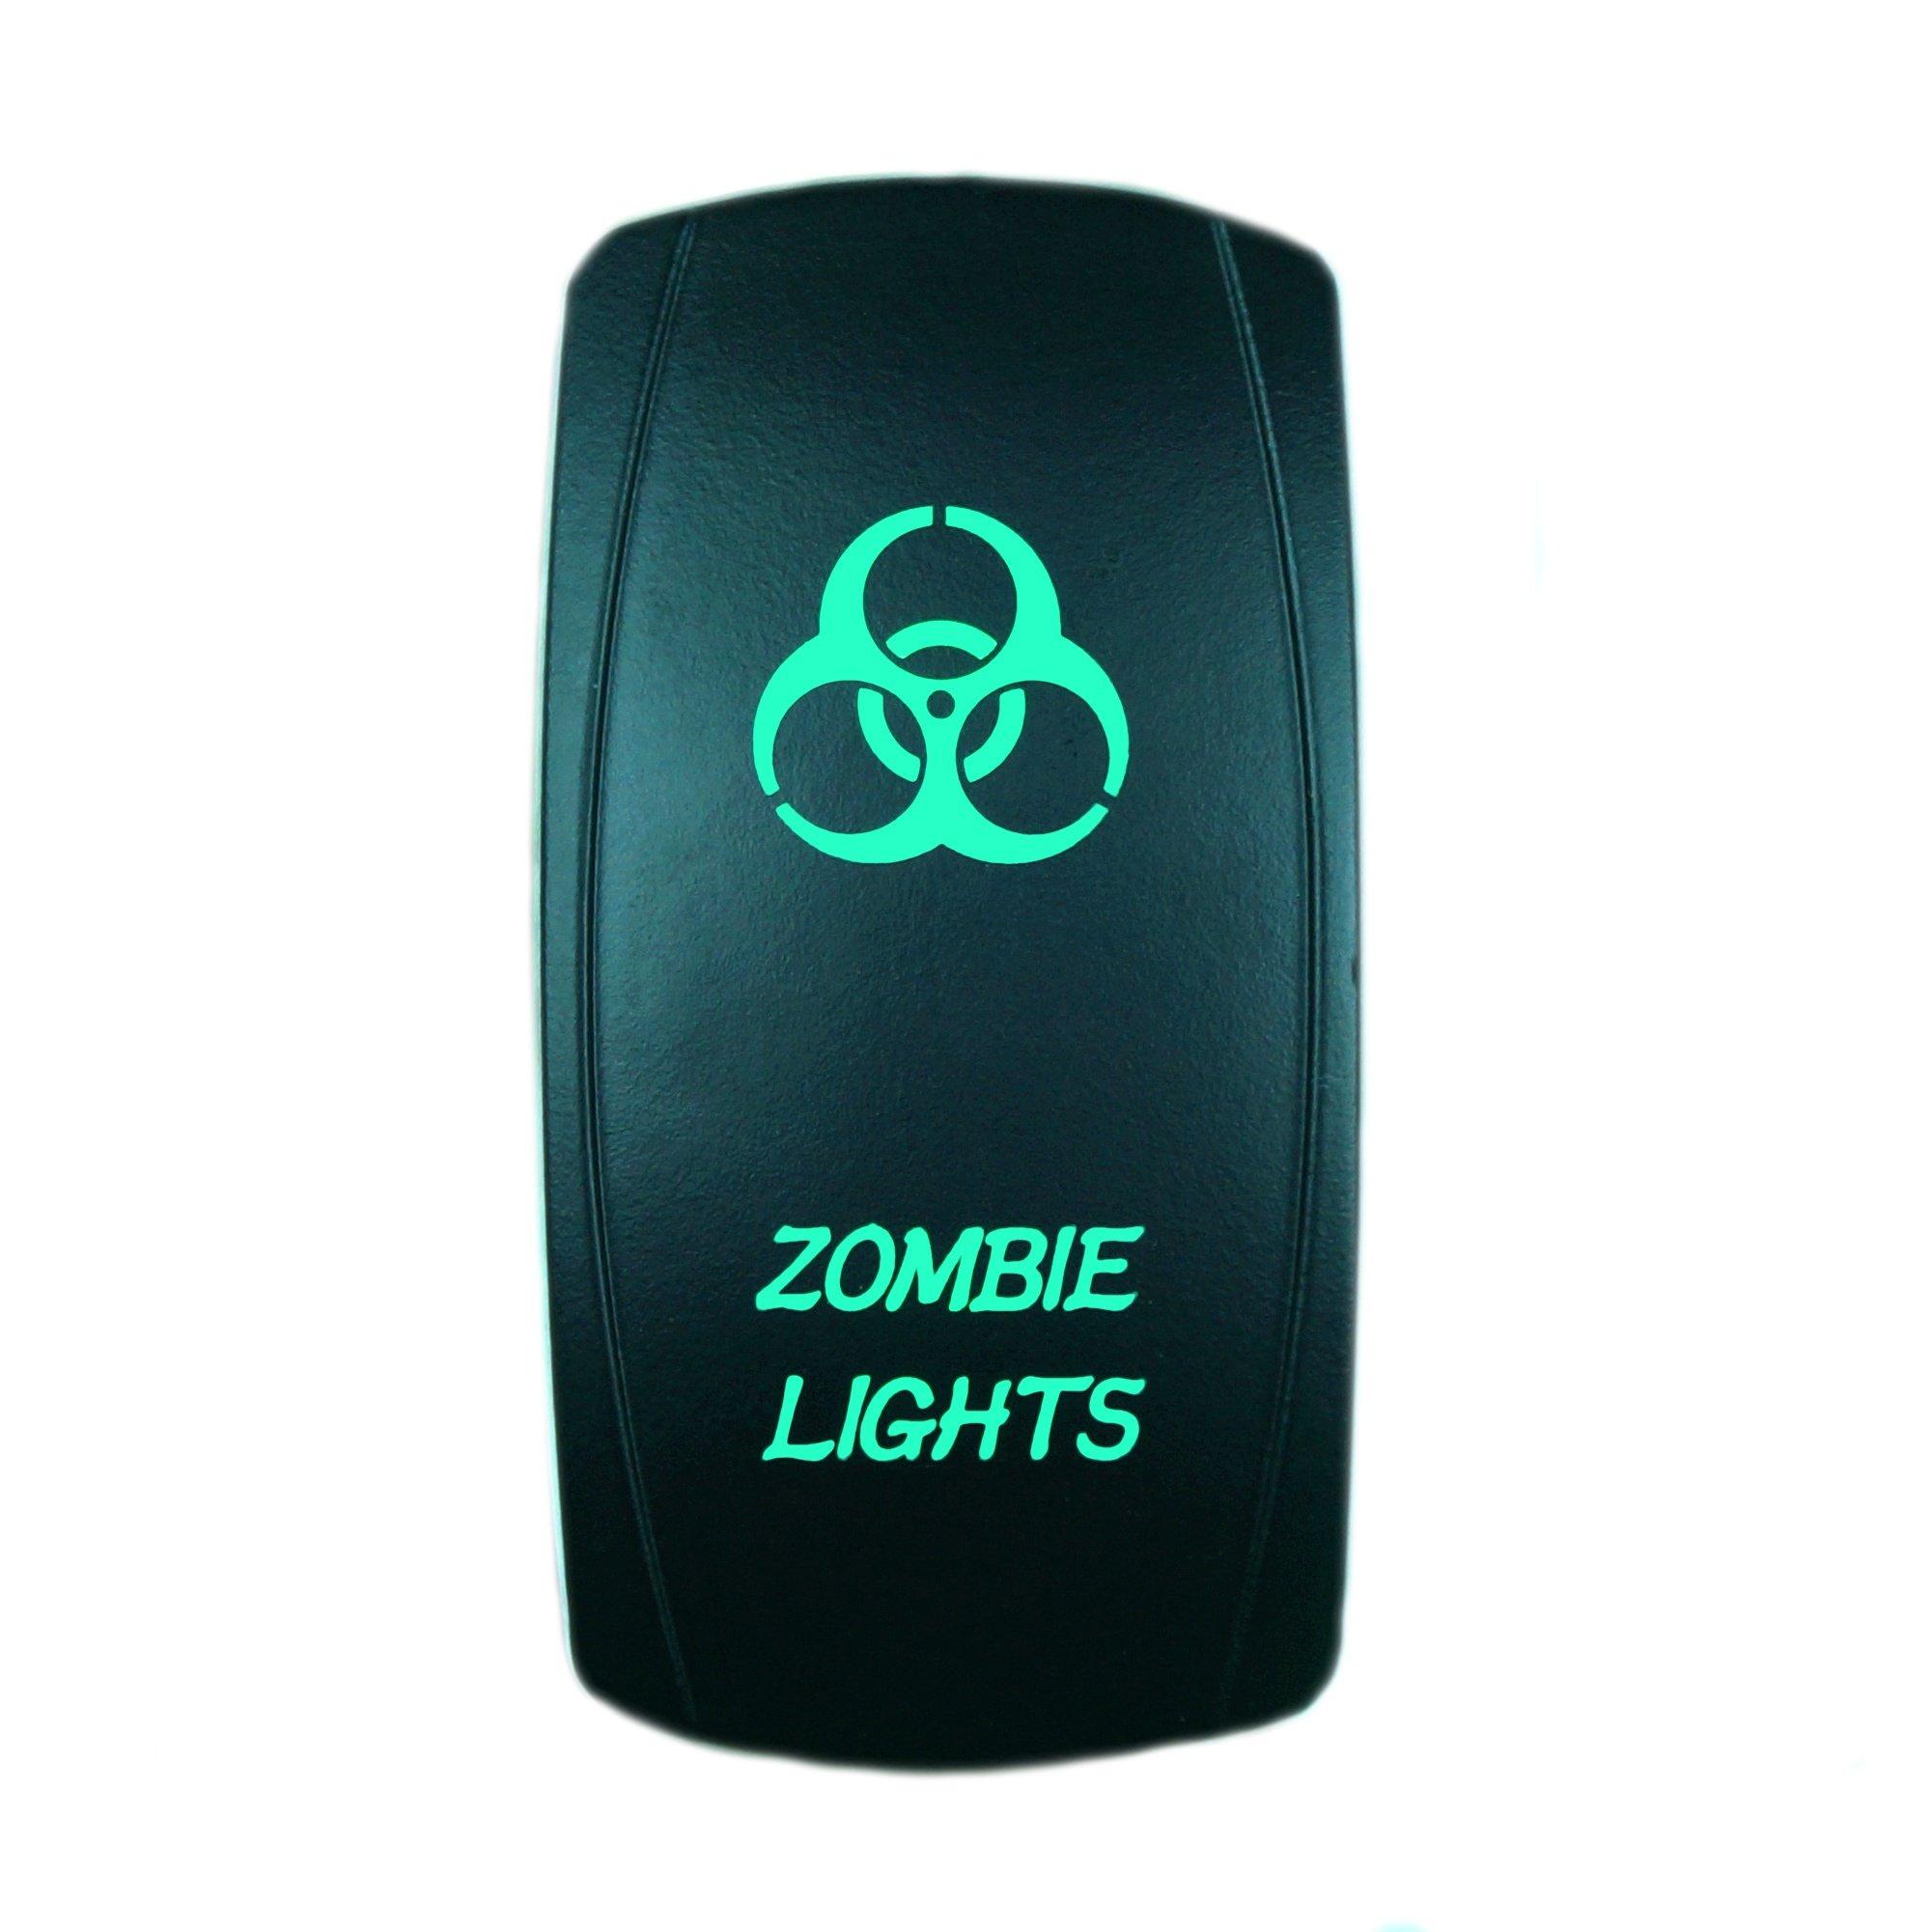 GREEN Laser Rocker Switch Backlit ZOMBIE LIGHTS 12V Bright Light Powersports [SLR1028BLPFBA]